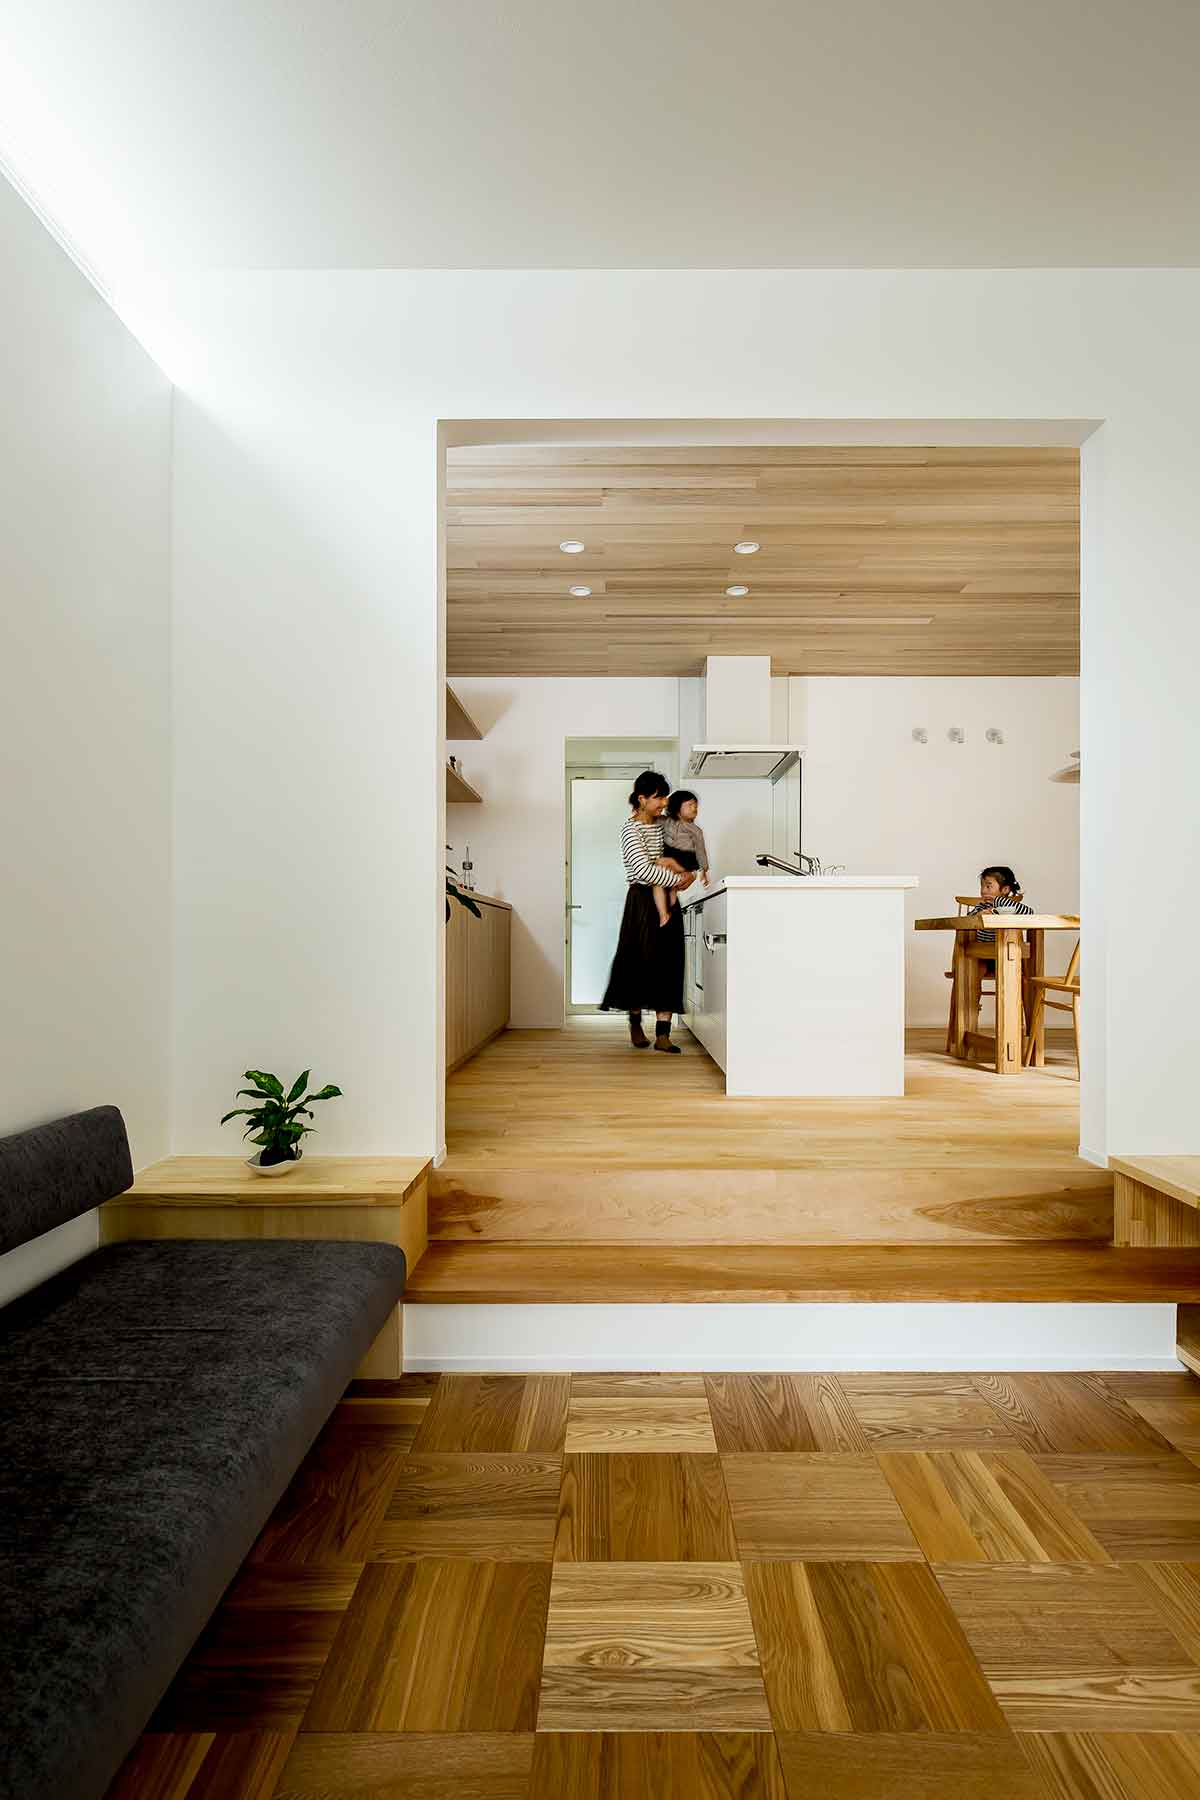 Architecture-by-Hearth-Architects,-Japan.--Photography-by-Yuta-Yamada-04.jpg